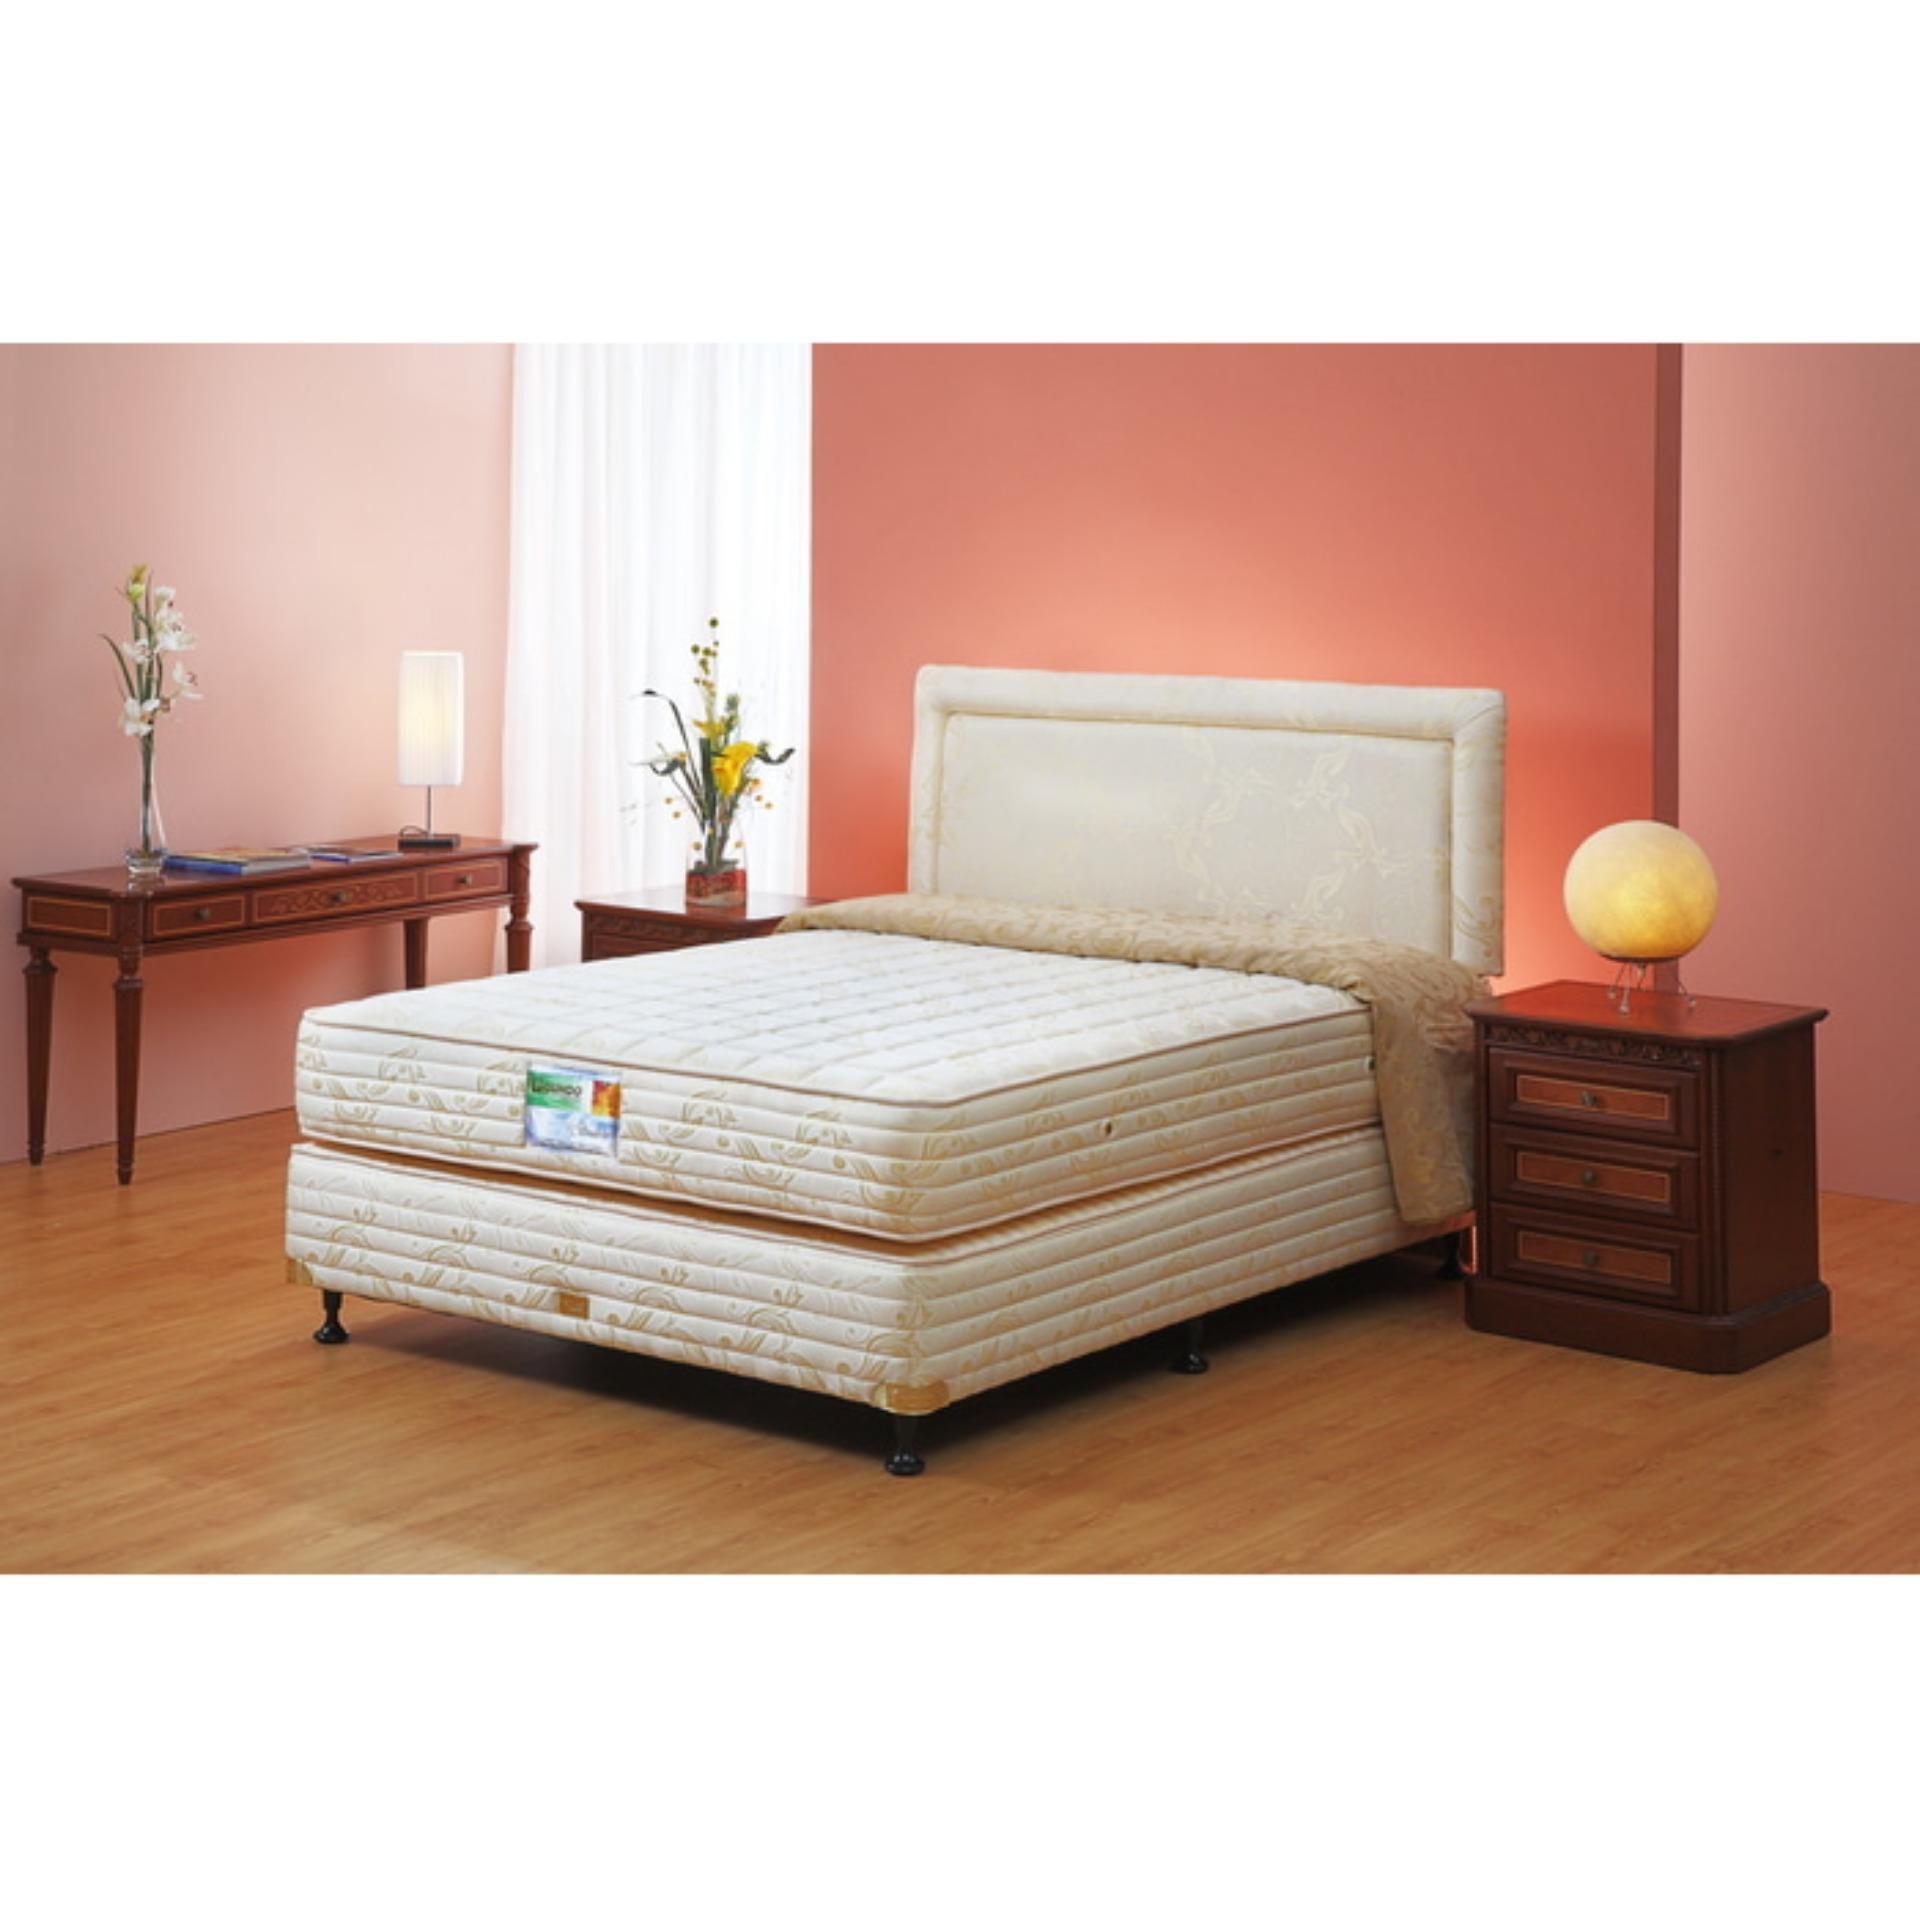 FREE ONGKIR Kasur Spring Bed Guhdo Standard Prospine - 90x200 Full Set